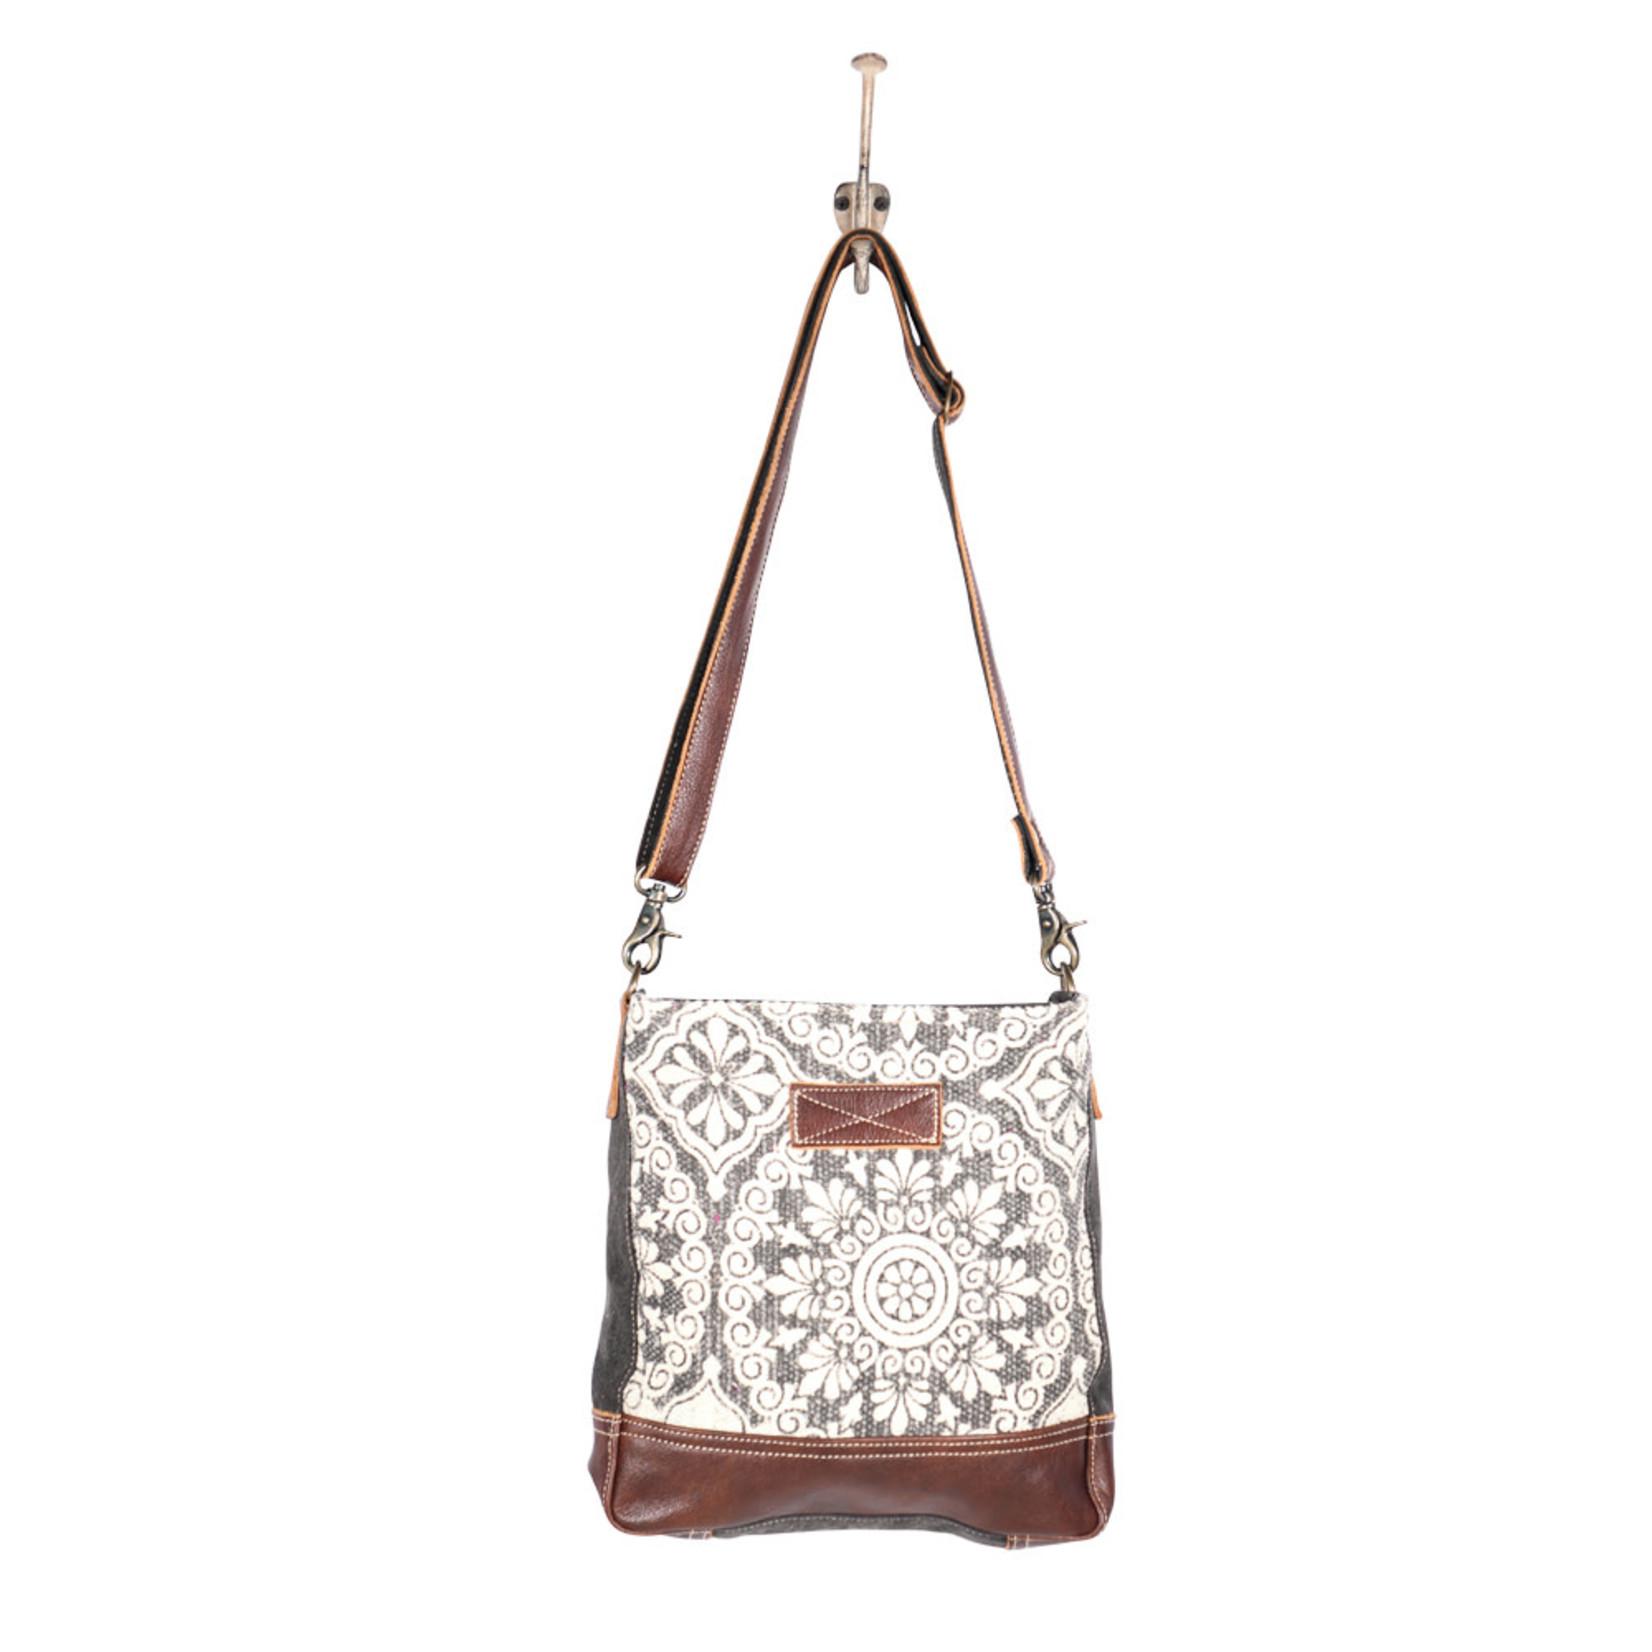 Myra Bags S-1900 Shoulder Bag